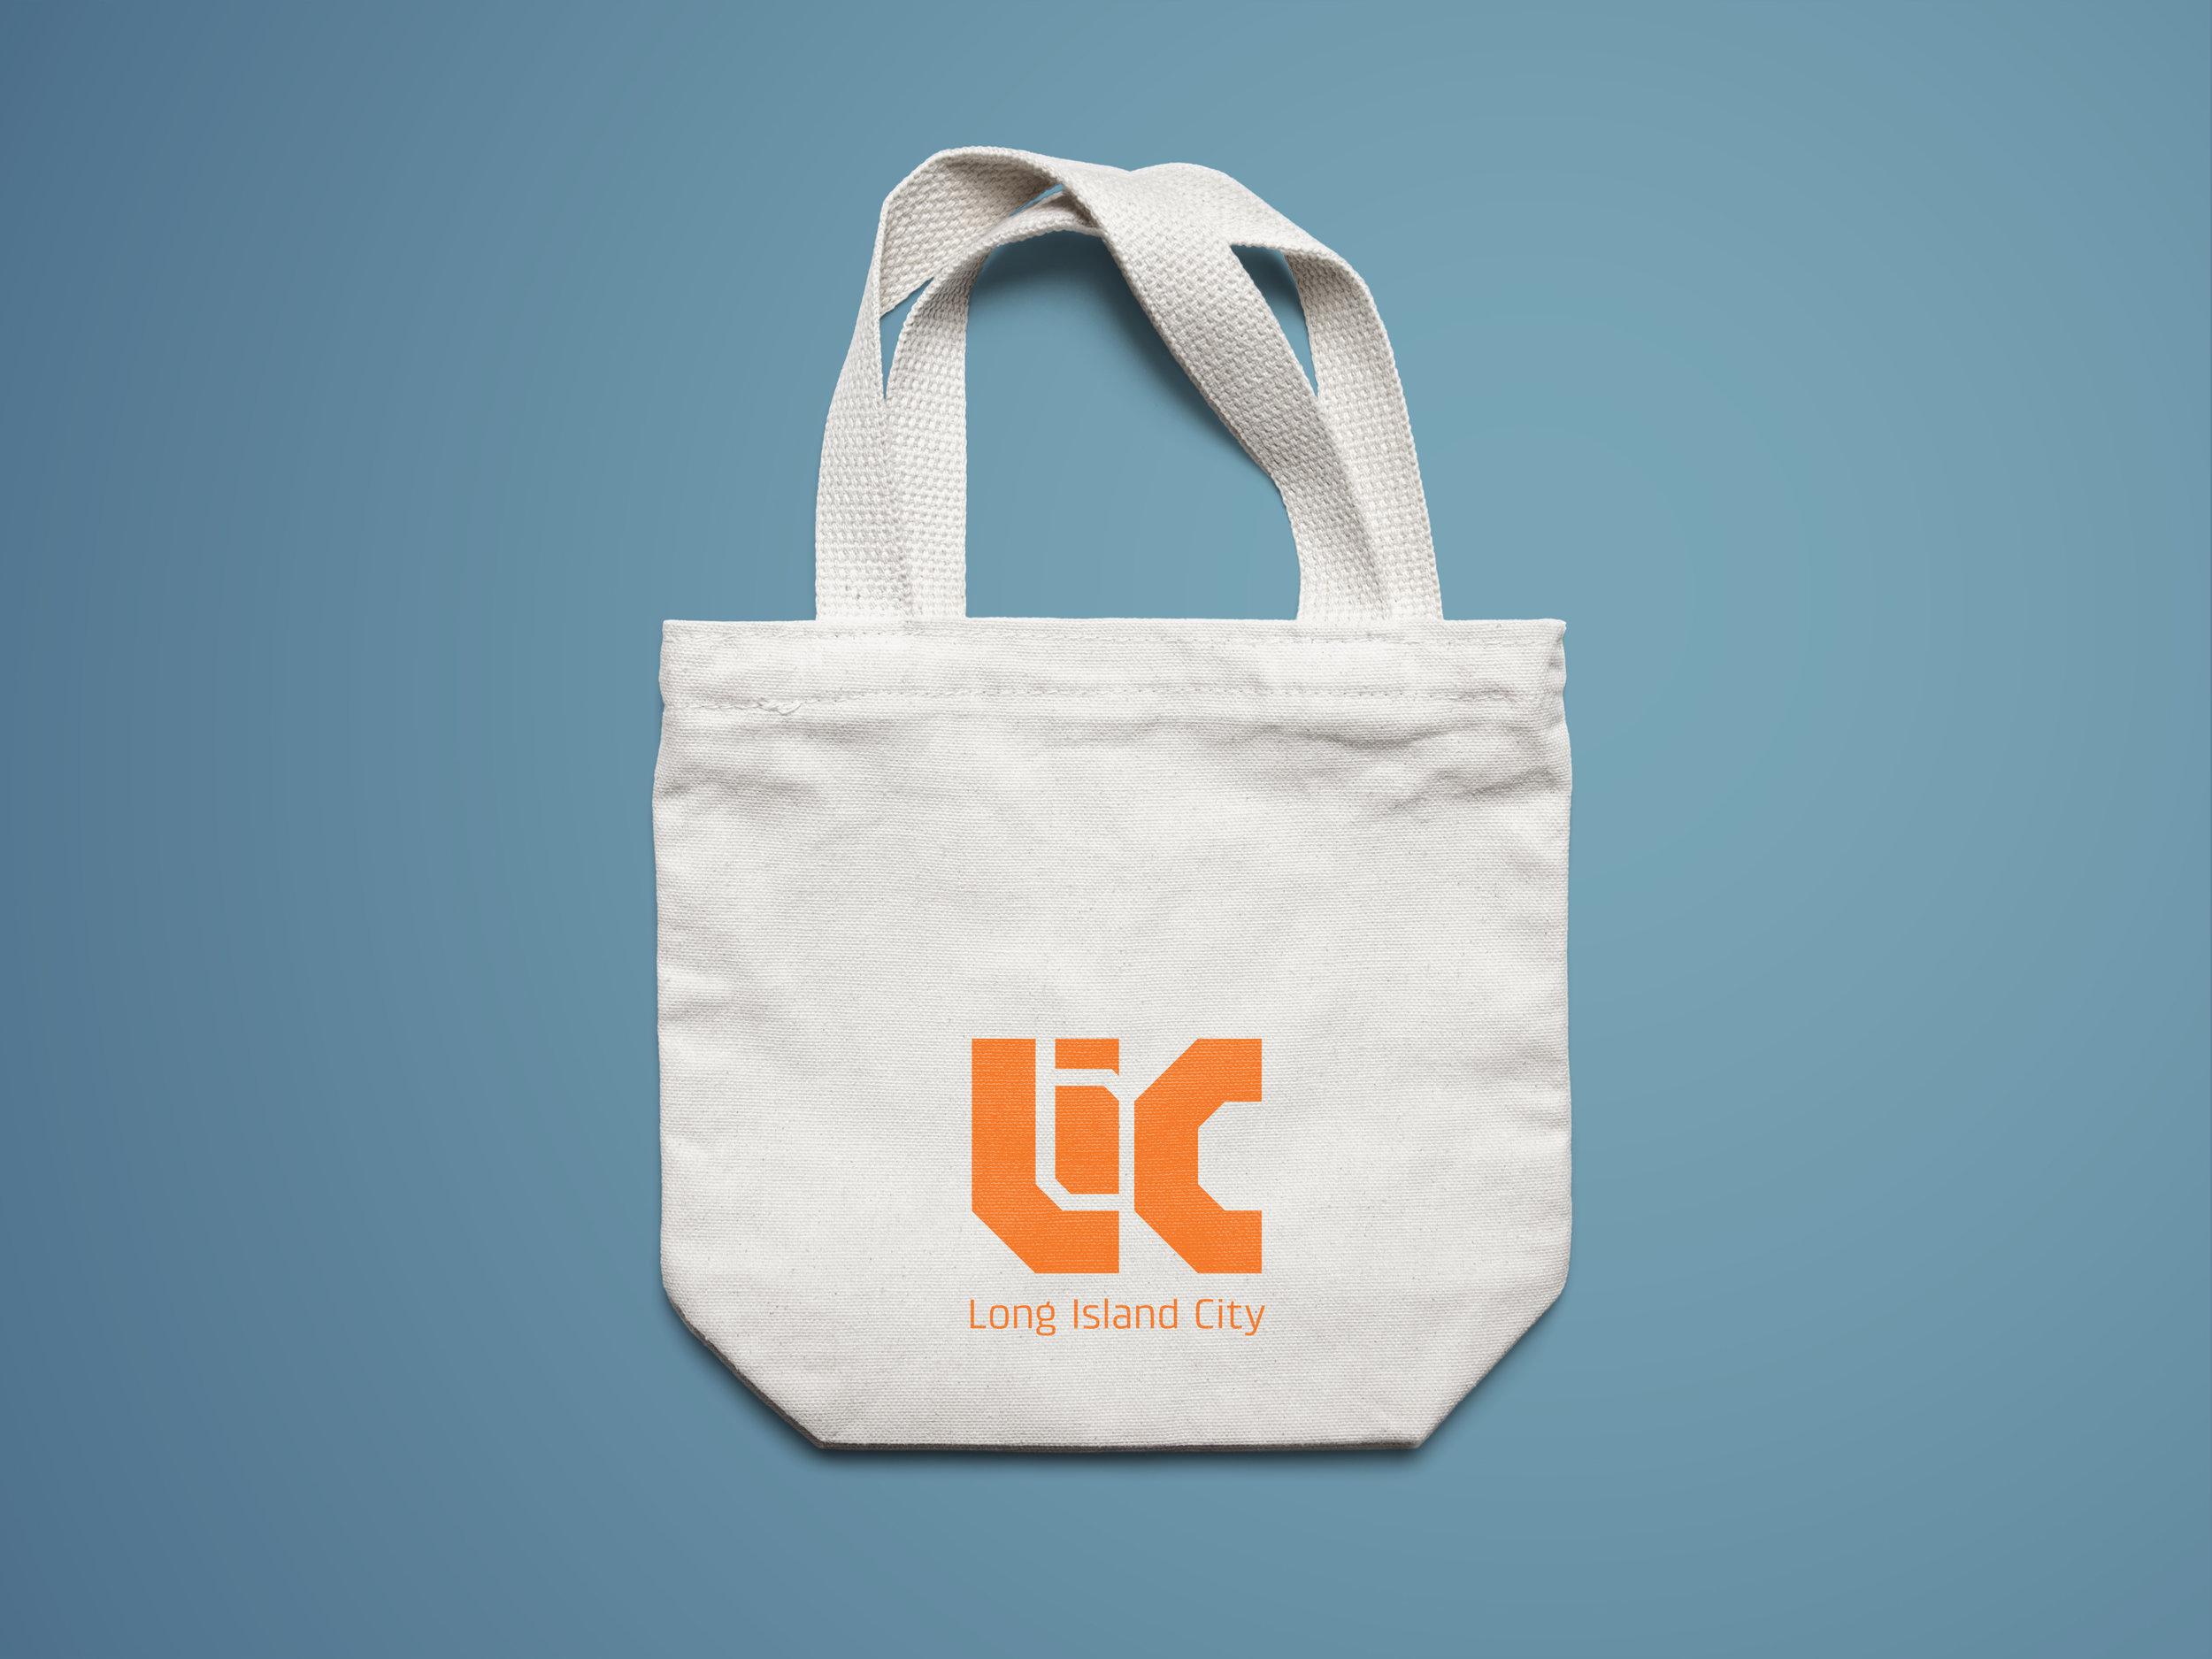 LIC-tote bag.jpg